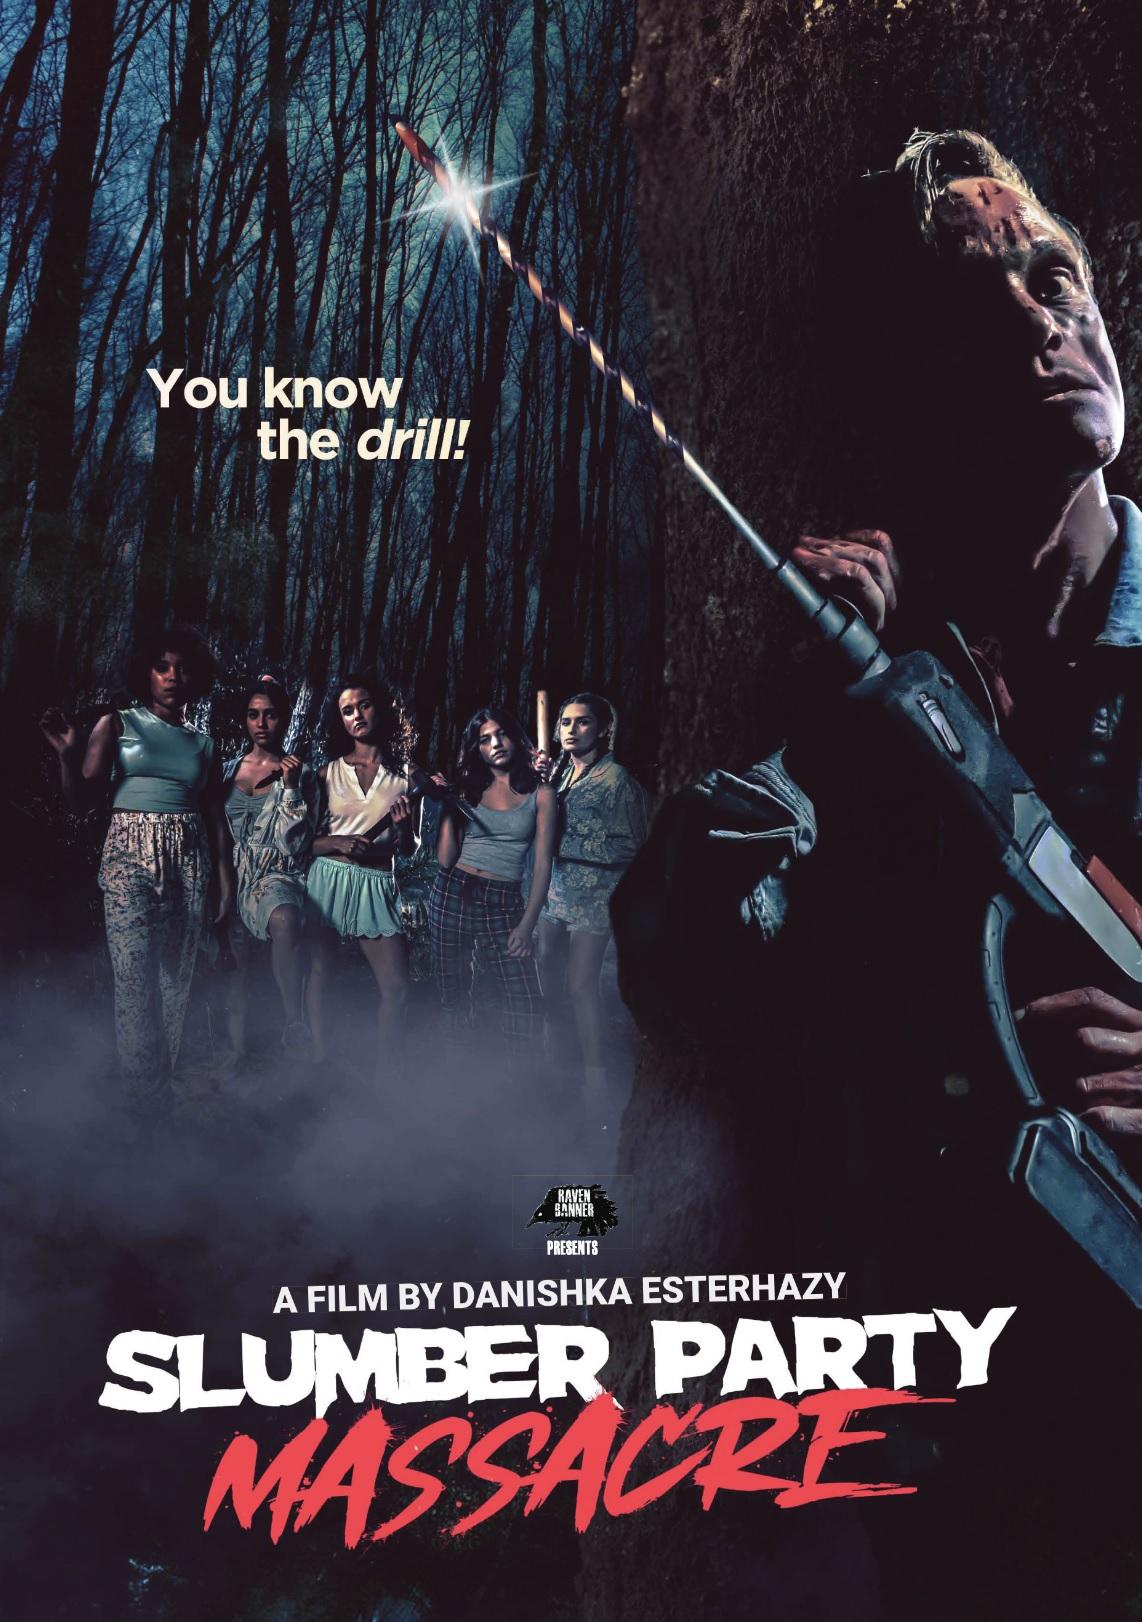 Slumber Party Massacre remake trailer announces October Syfy premiere date